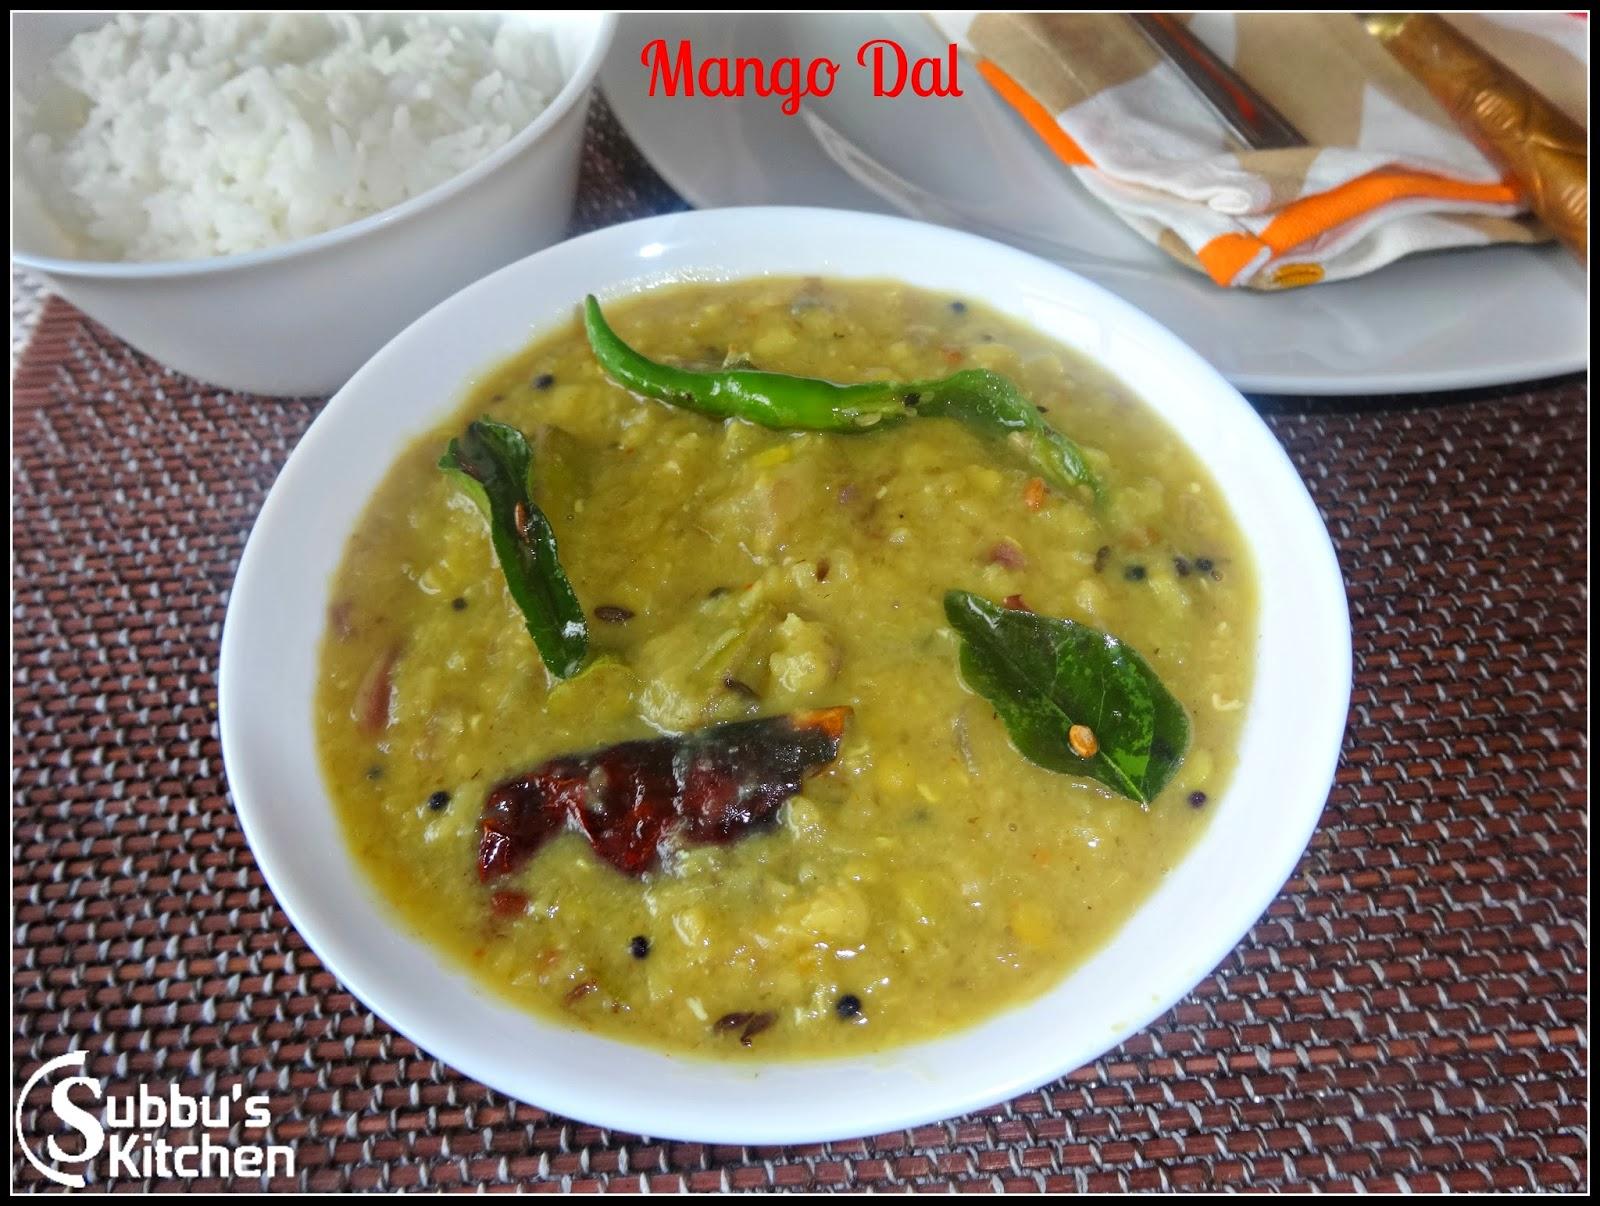 Mango Dal